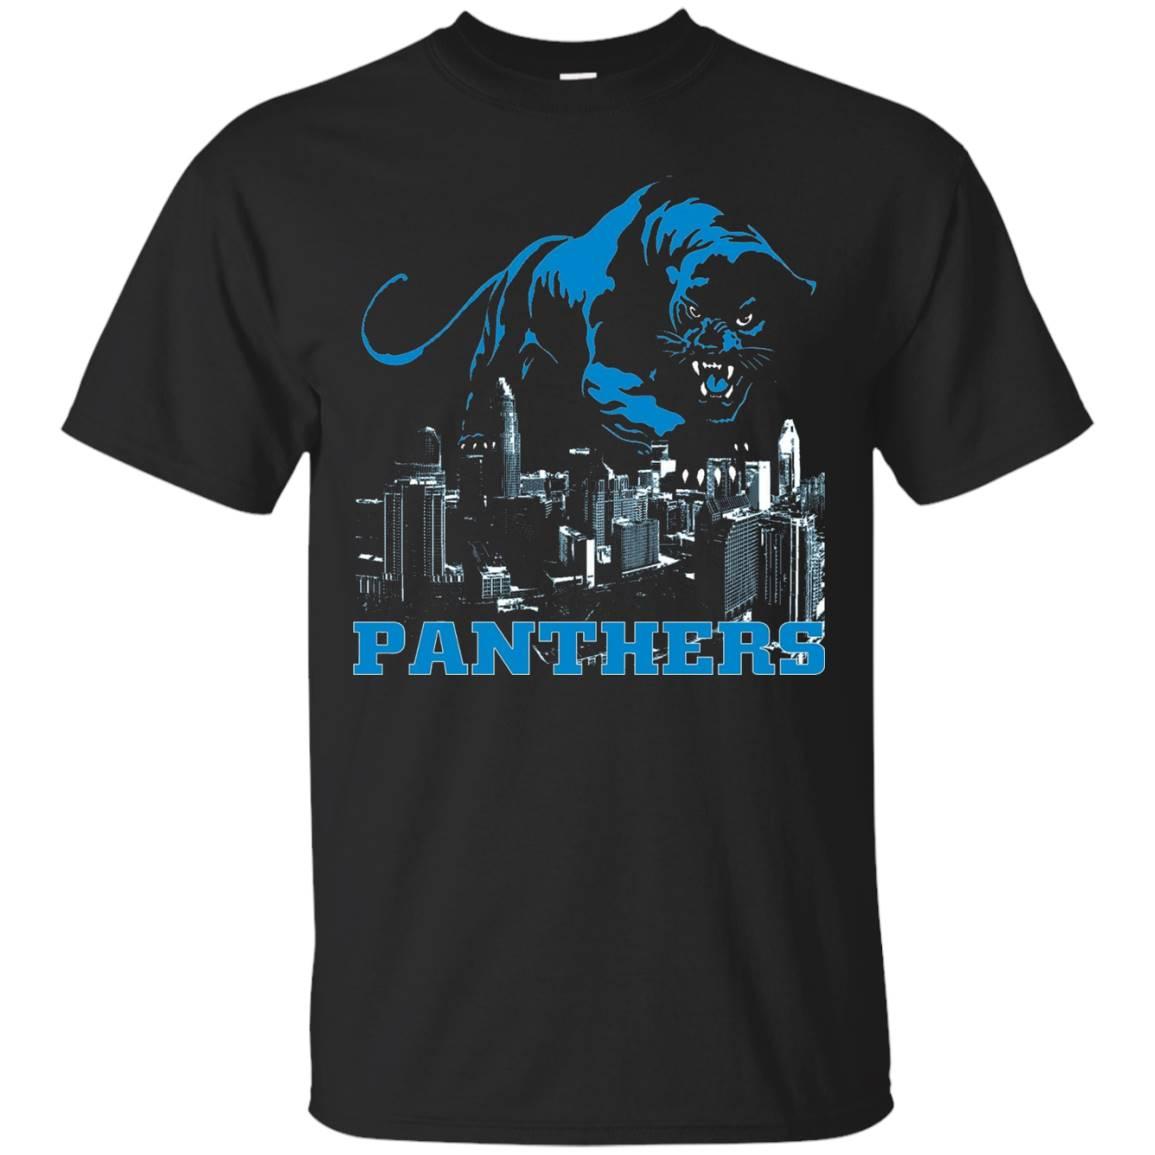 Panthers Sports Gear Football T-Shirt Over Carolina City